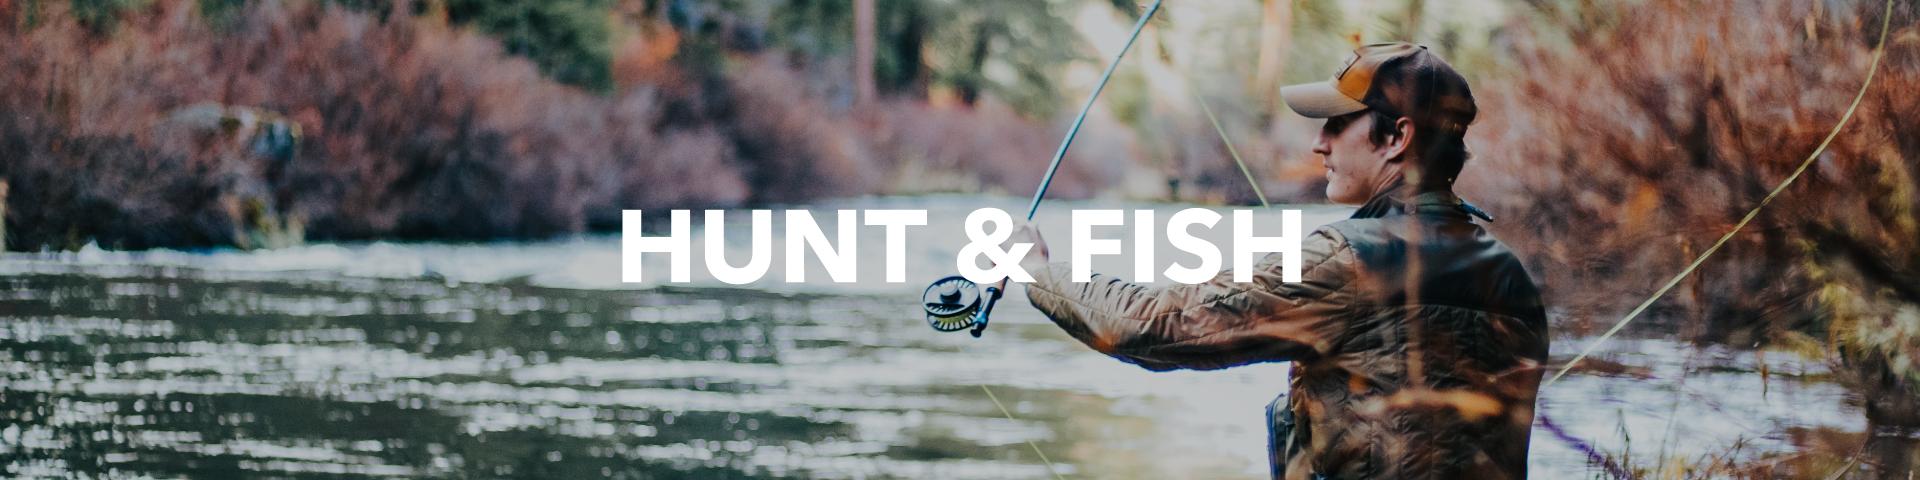 Hunt & Fish Department